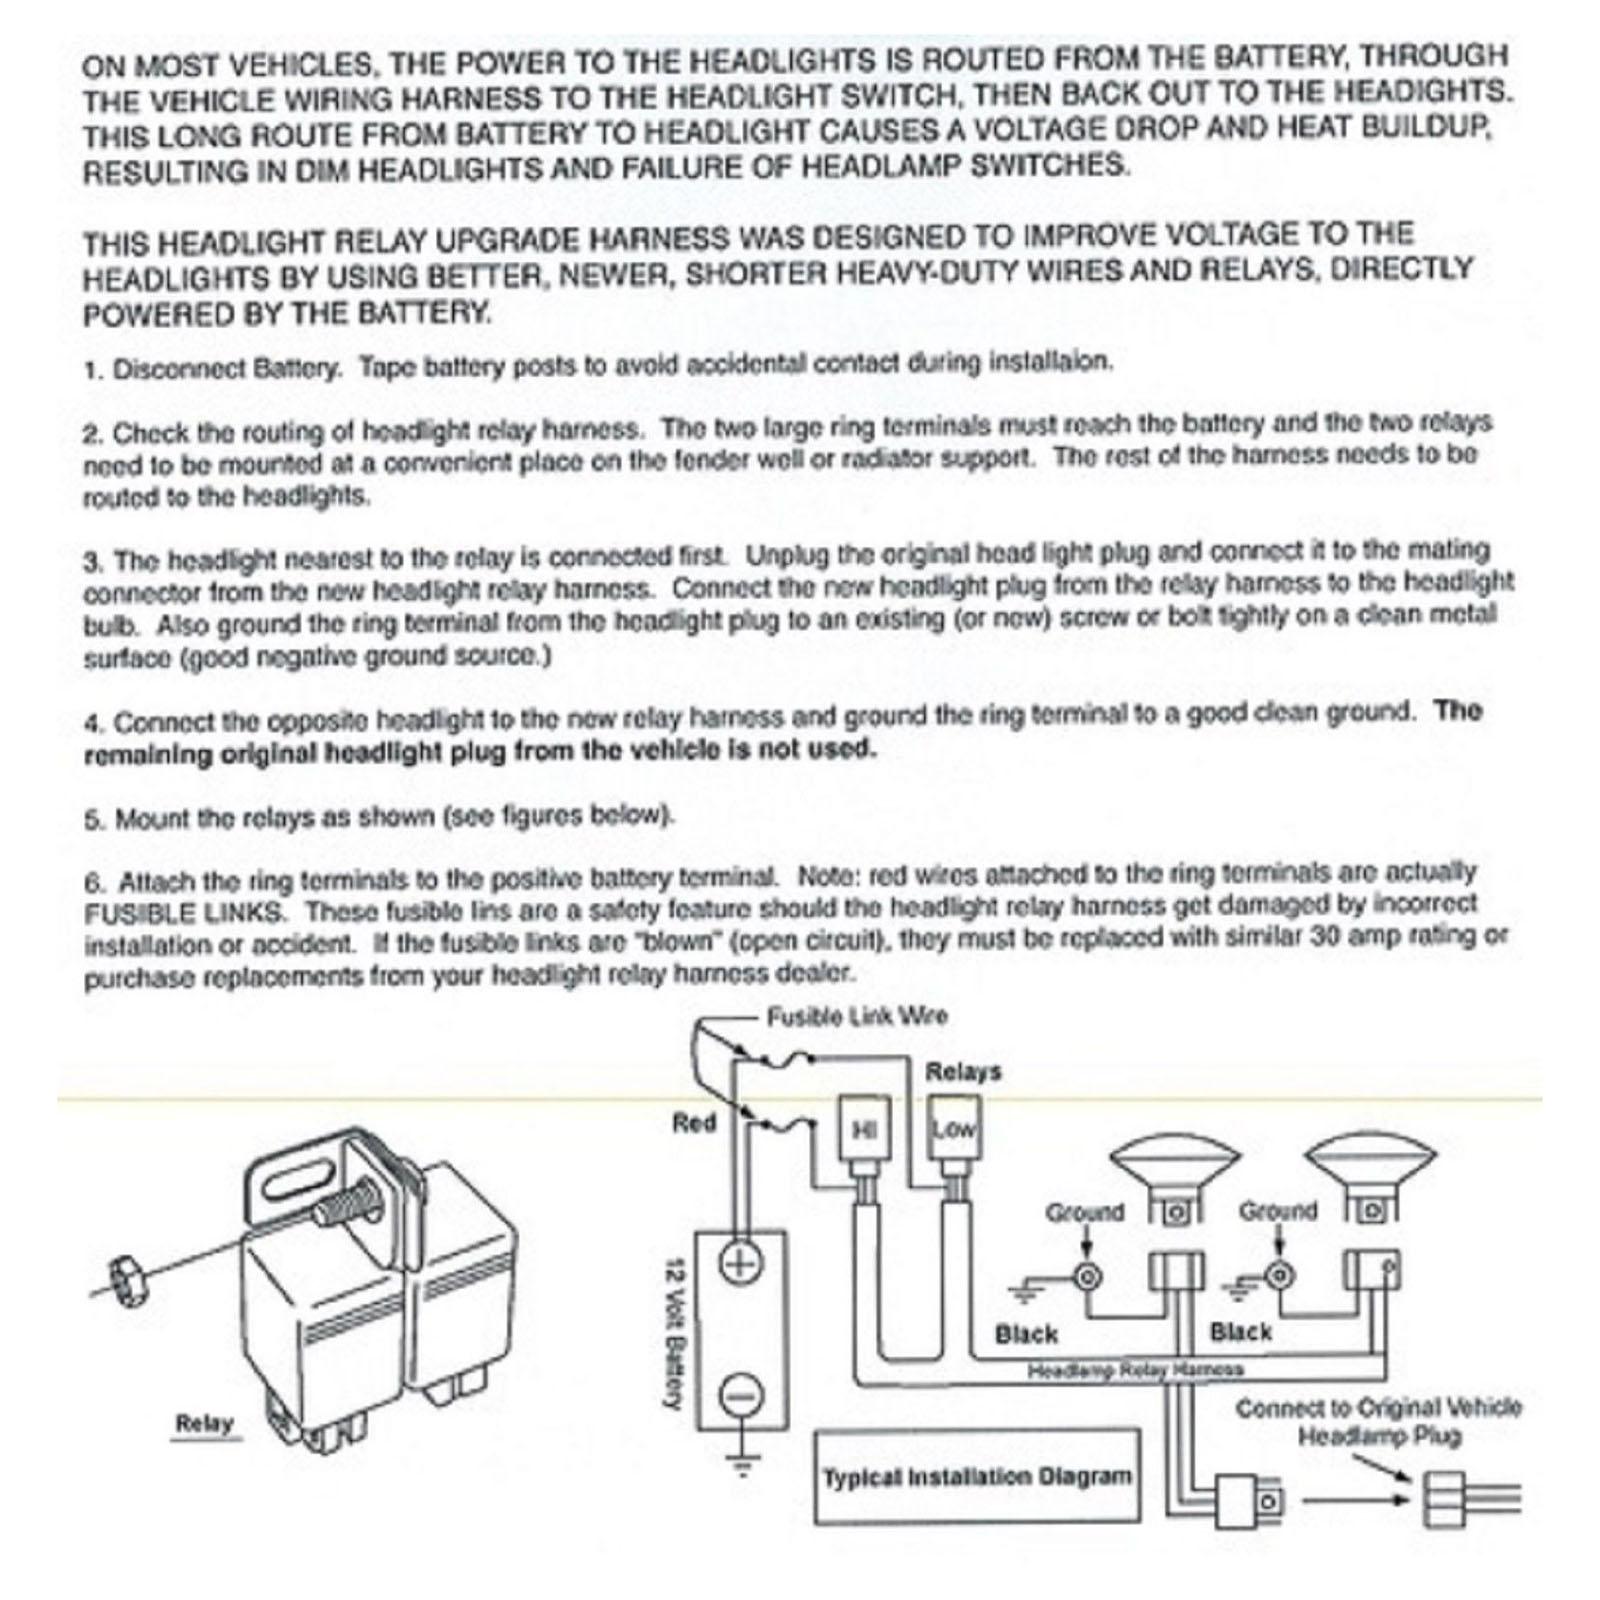 hight resolution of ceramic h4 headlight relay wiring harness 2 headlamp light bulb socket plugs 7x6